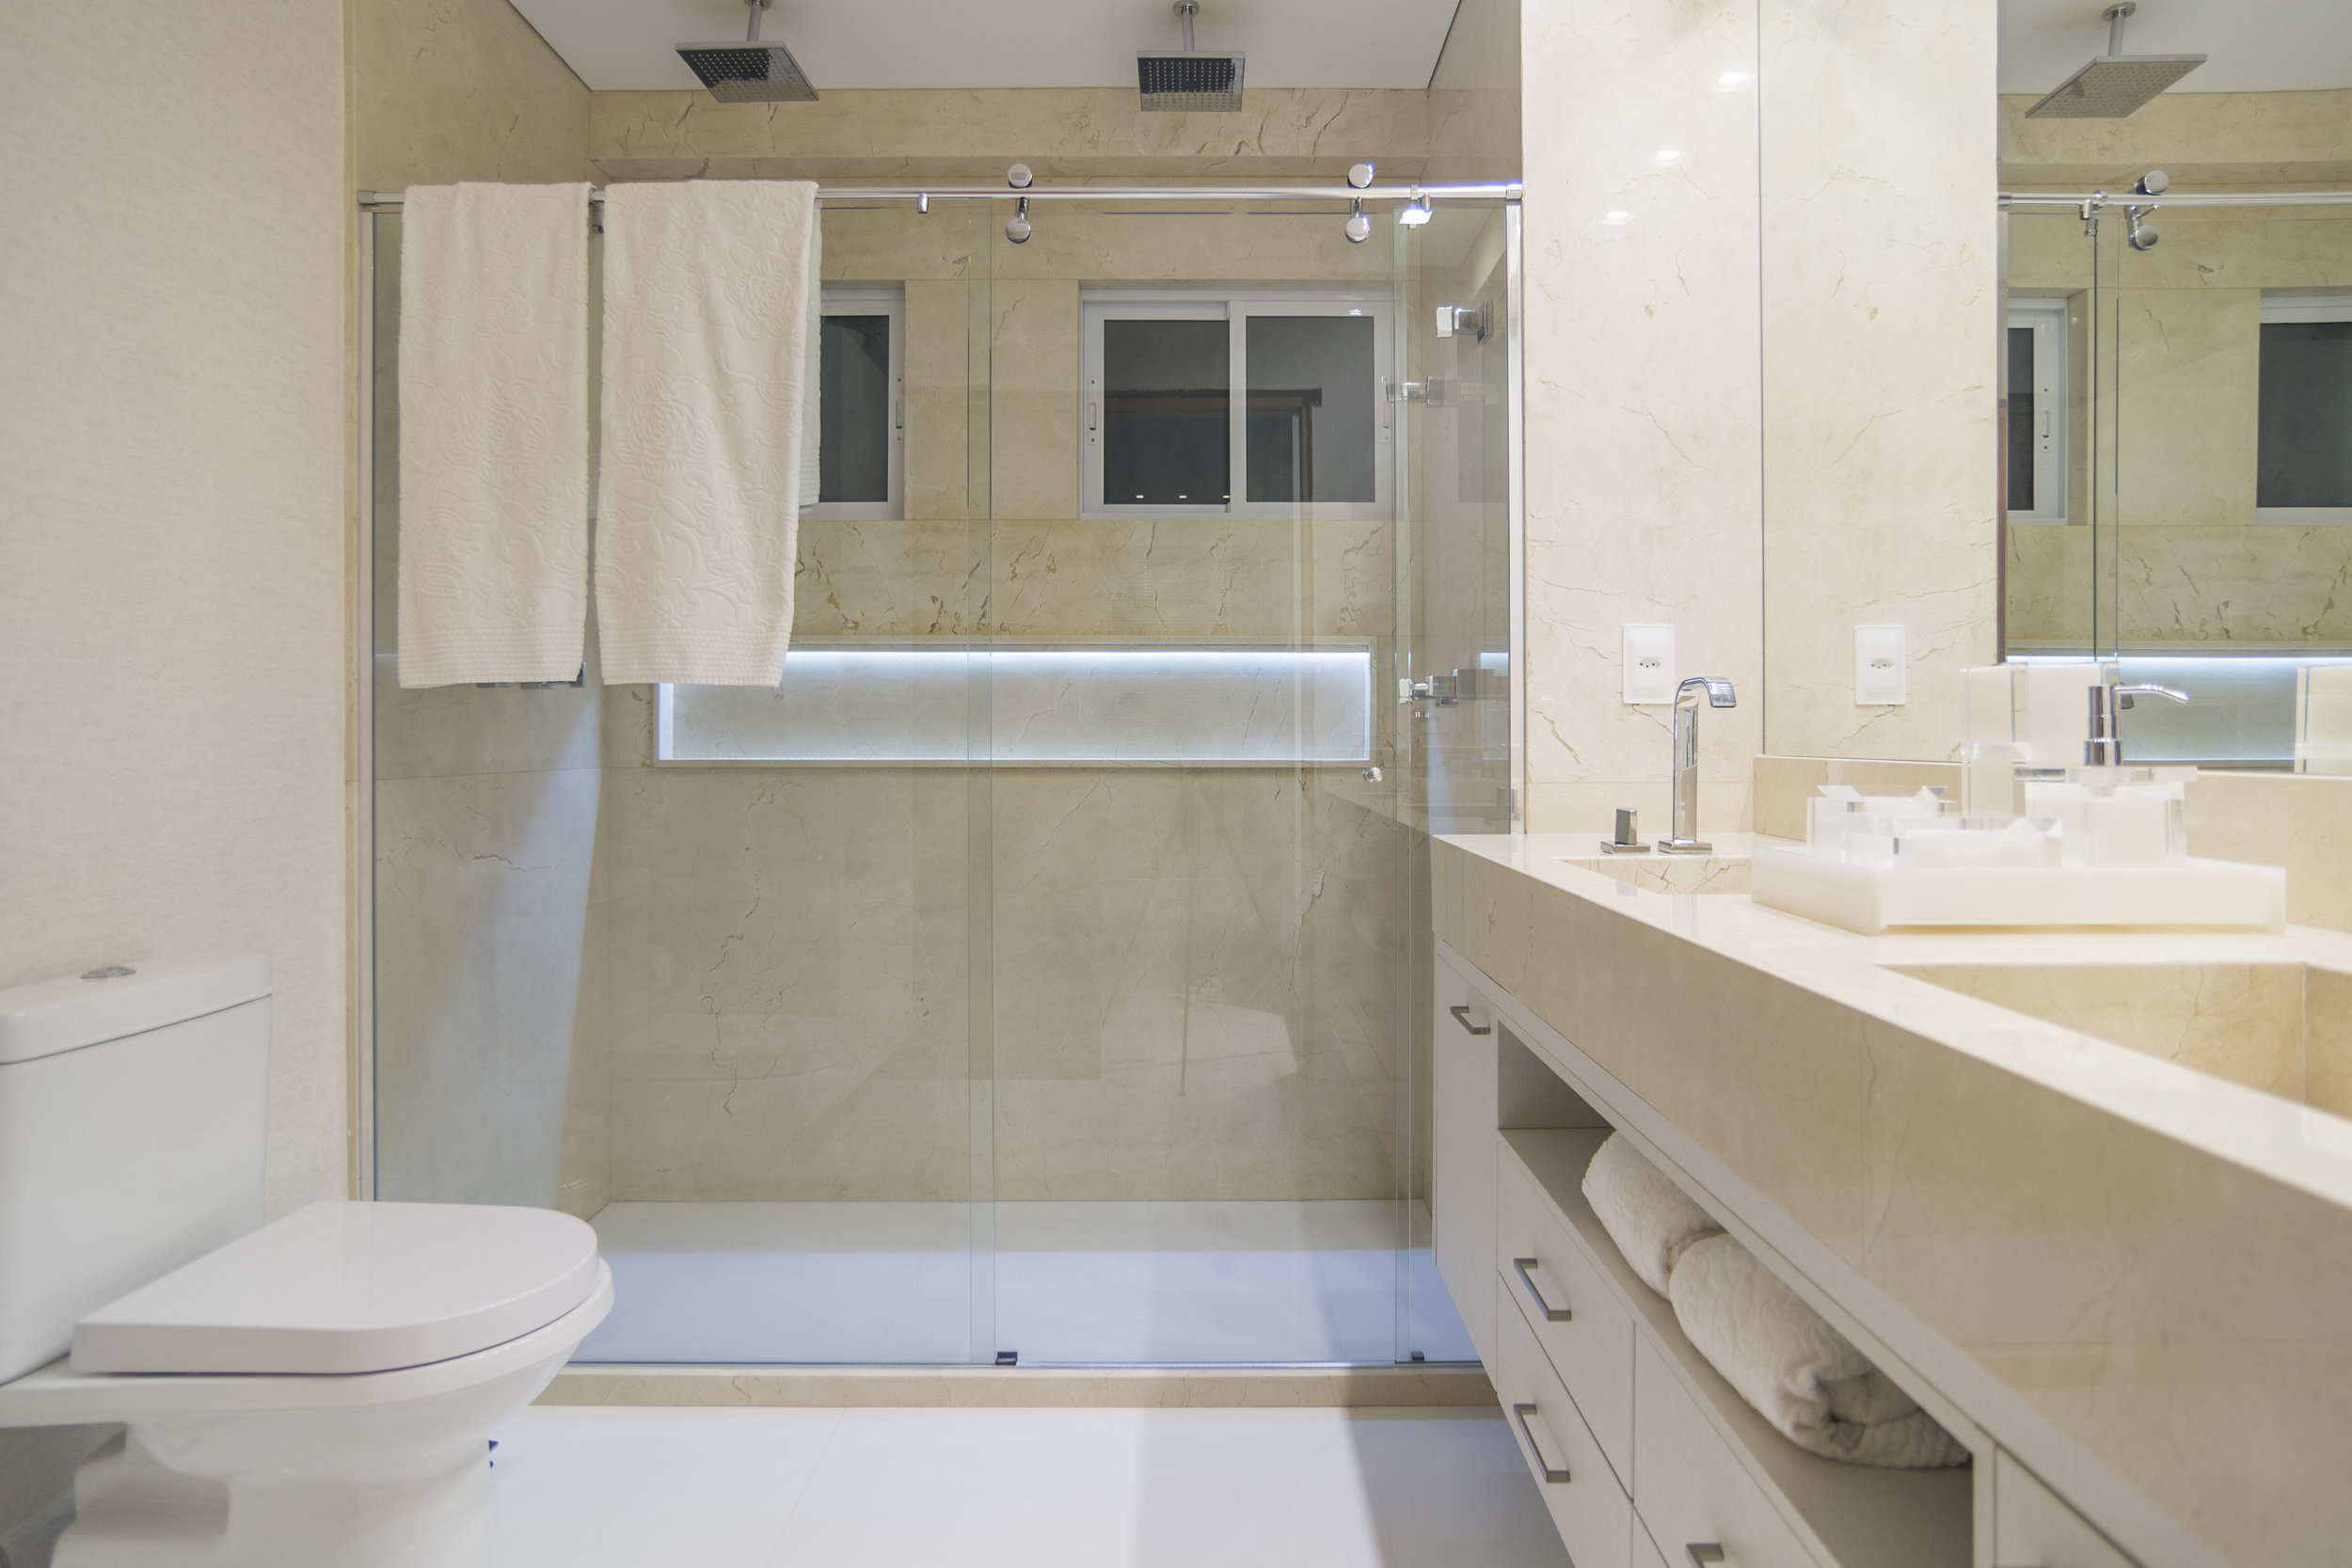 projeto-arquitetonico-robertoindira-duo-arquitetura-apartamentos-quarto-05.jpg